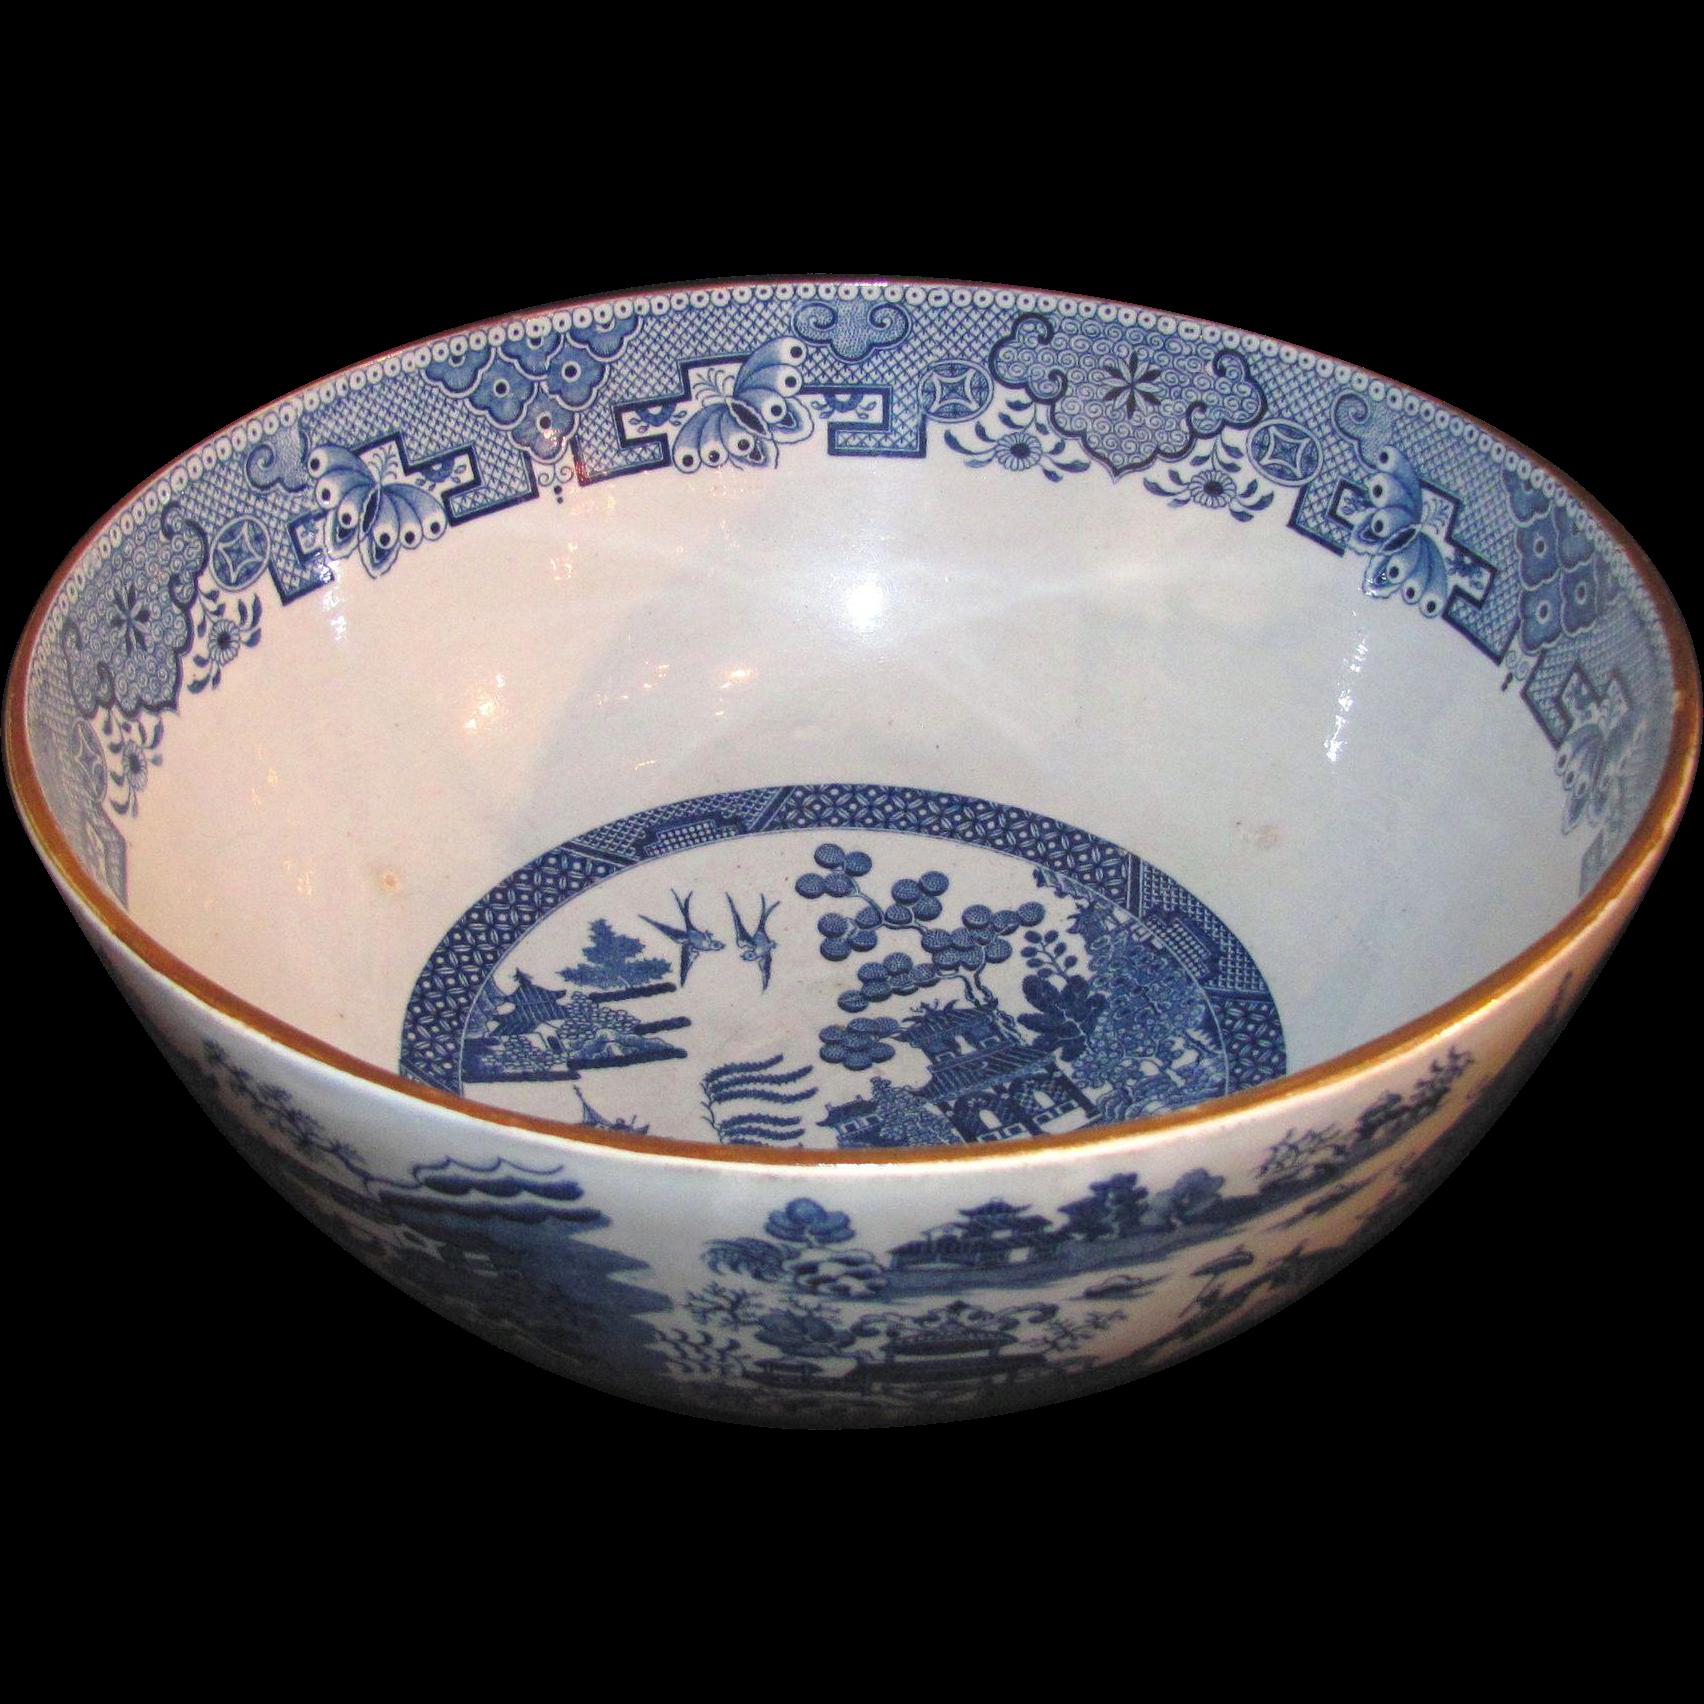 Early Antique English Staffordshire Transferware Serving Bowl Circa 1800